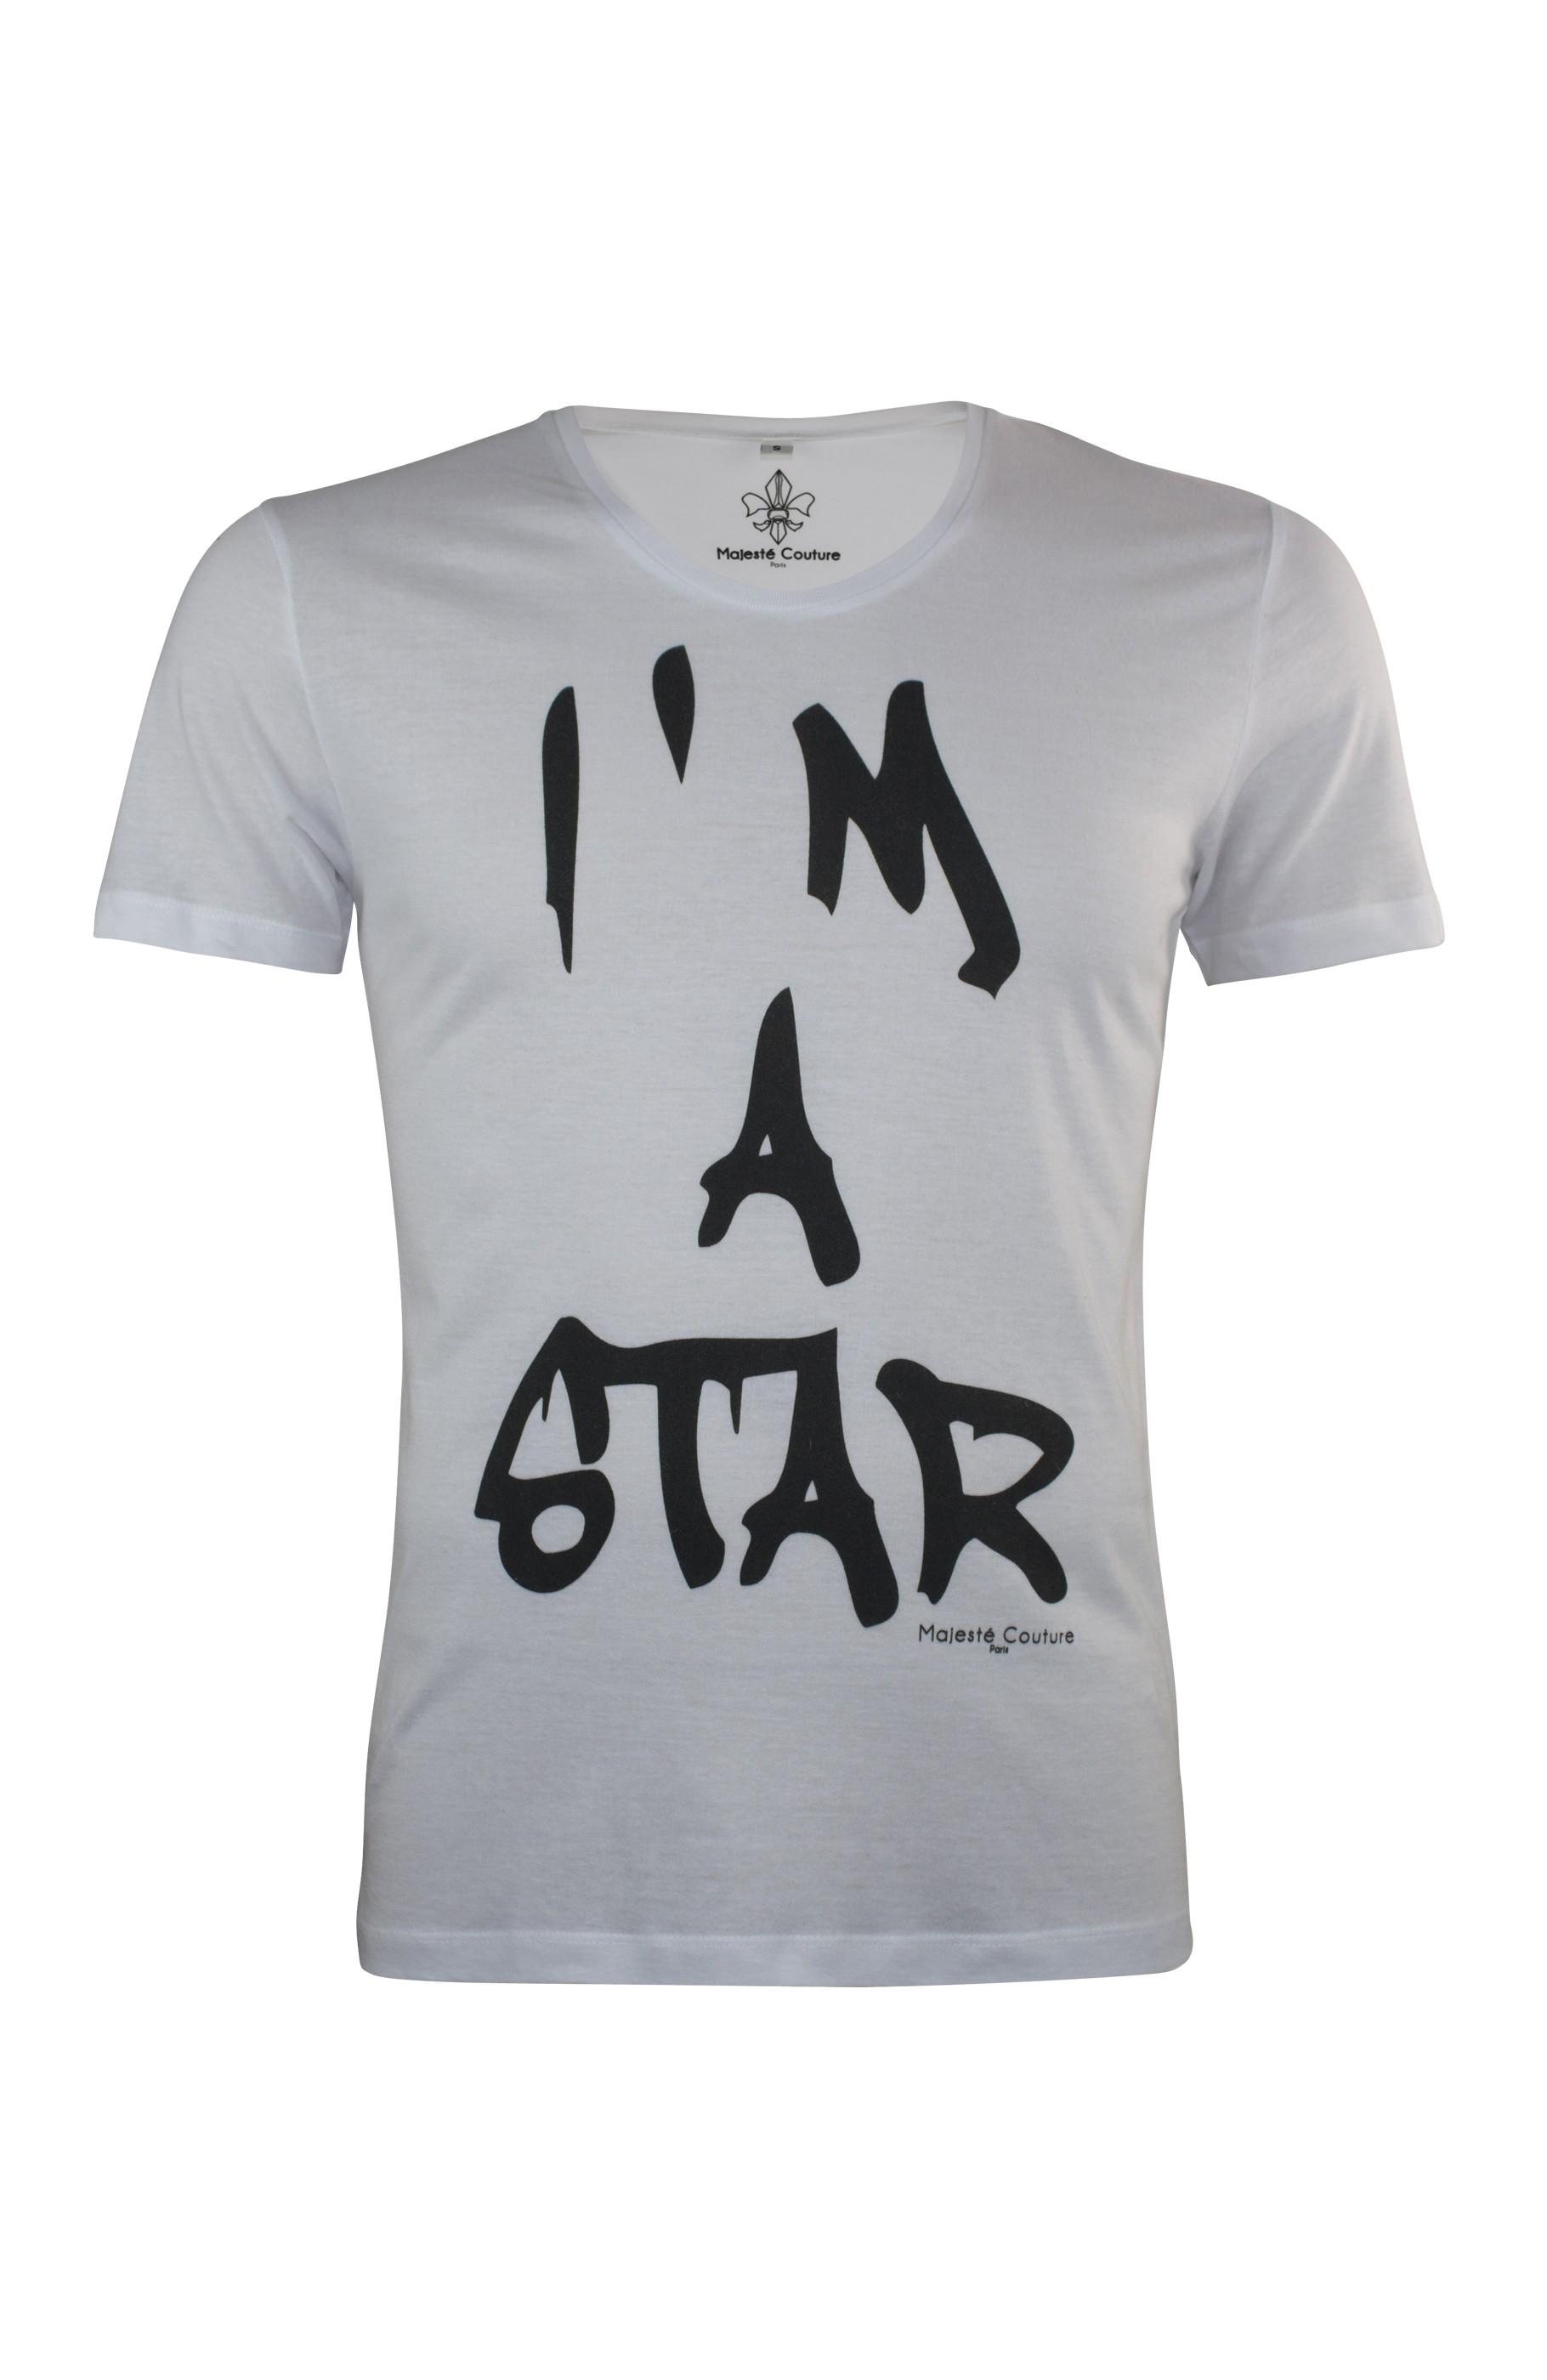 Im black t shirt - T Shirt I M A